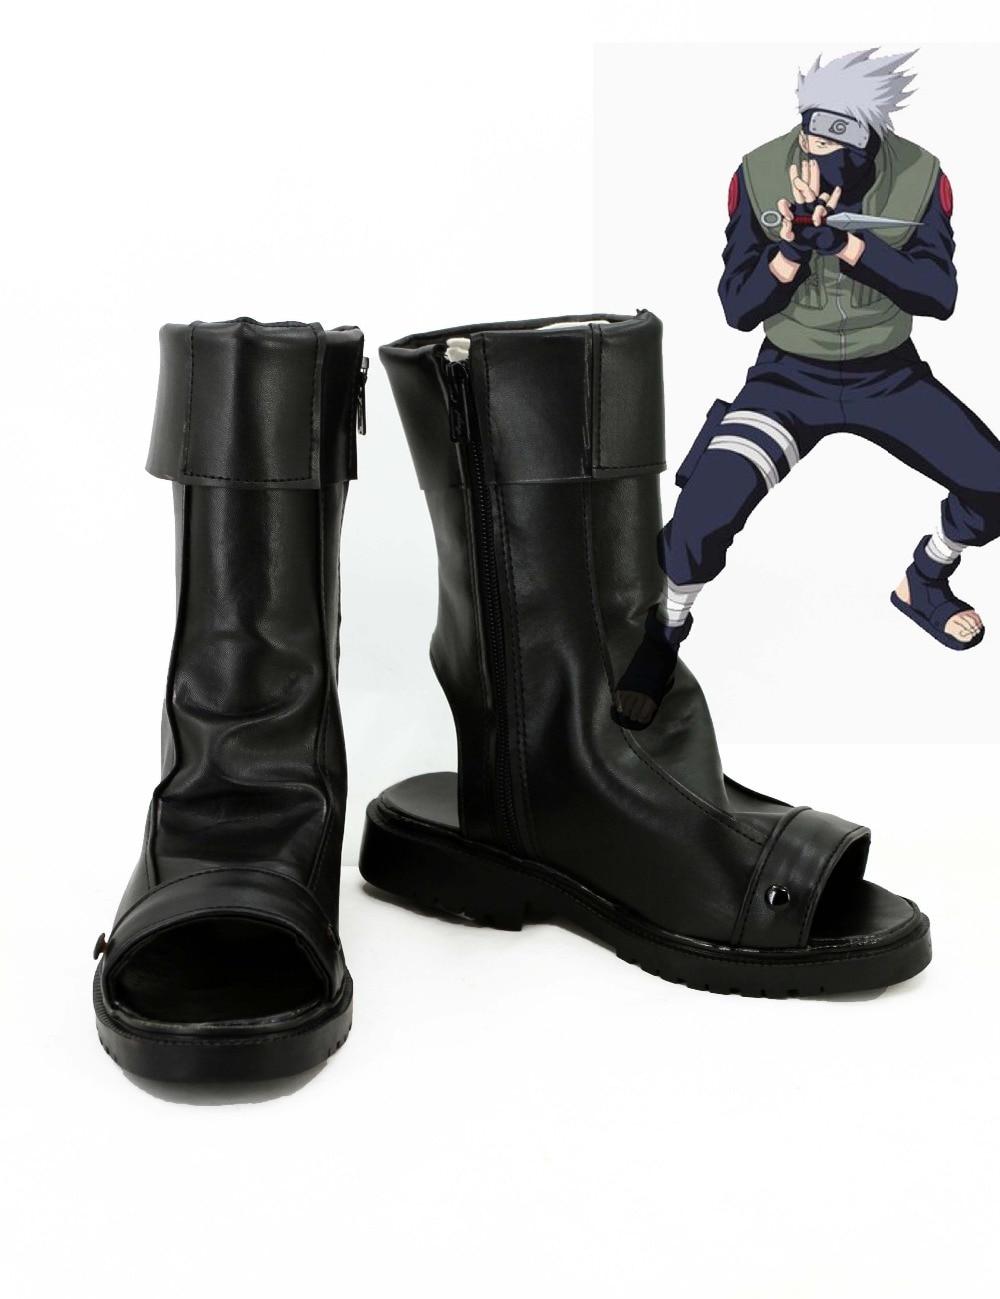 Hot Anime Naruto Kakashi Cosplay Costume Boots Shoes Christmas Party New Coming Boy Shoe Black